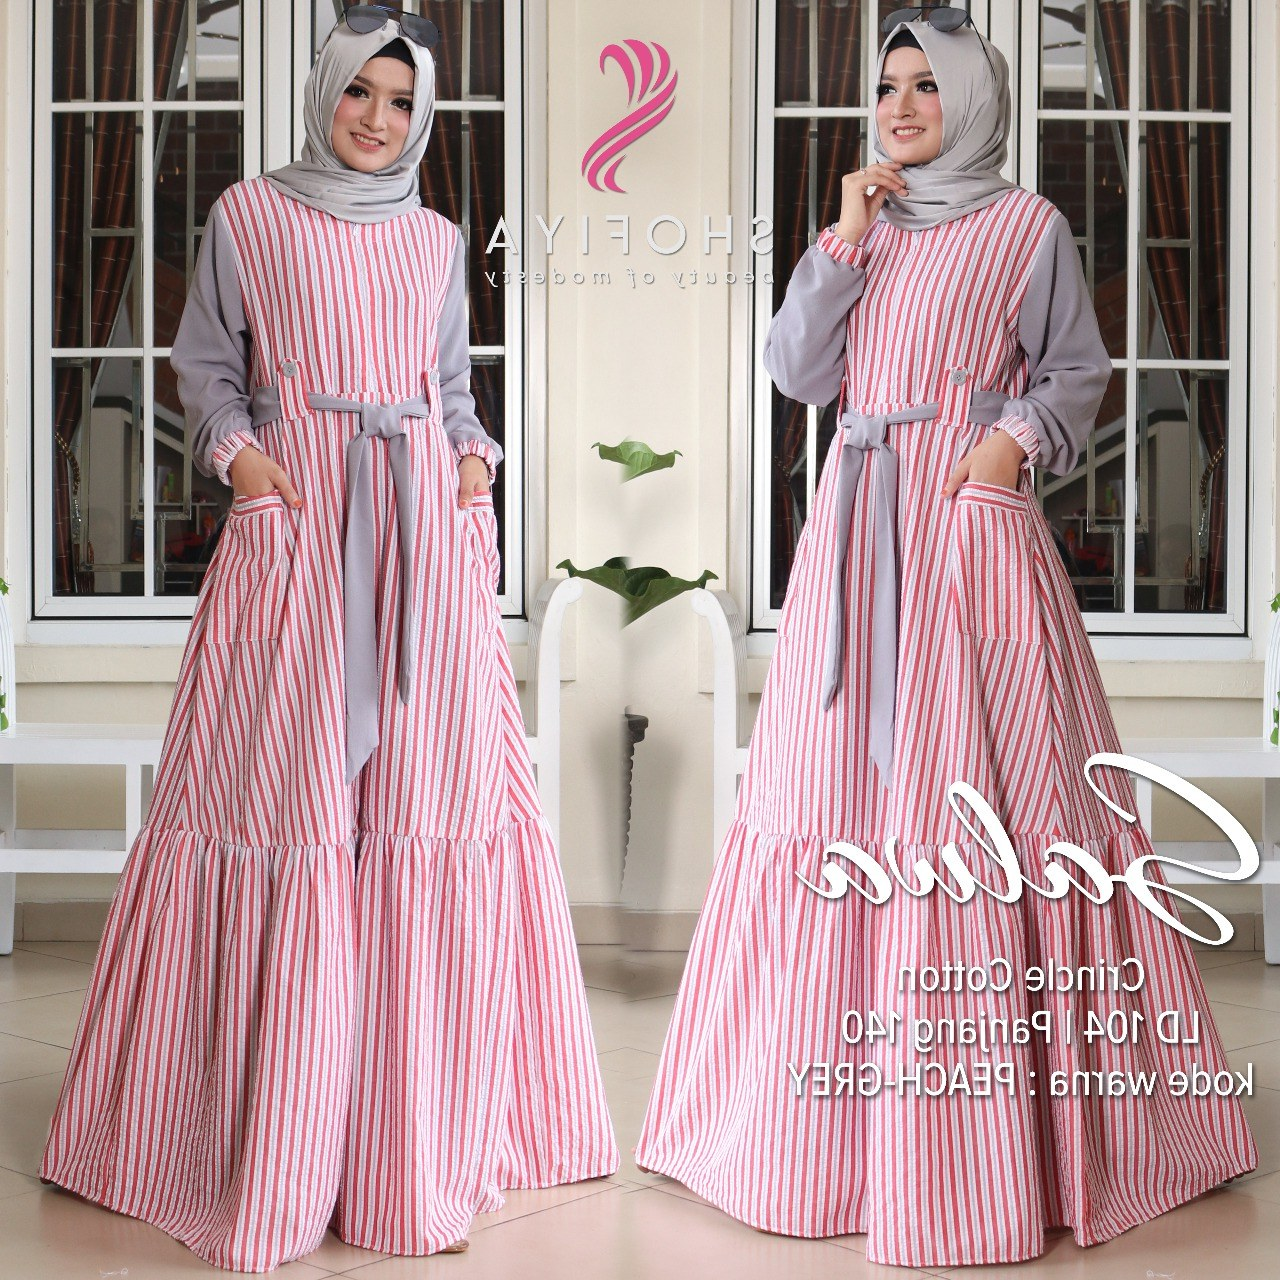 Bentuk Baju Lebaran Model Baru Qwdq Model Baju Gamis Terbaru Lebaran Gambar islami